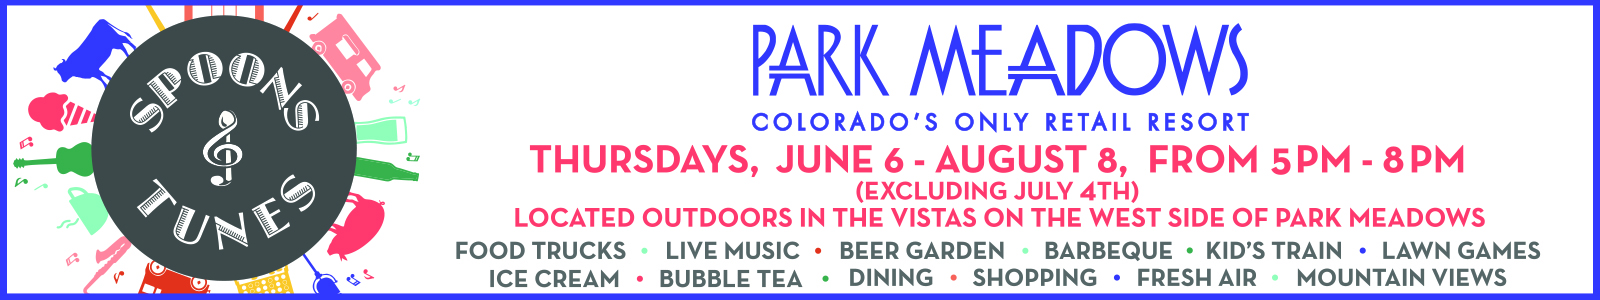 Park Meadows 1600x300 banner ad